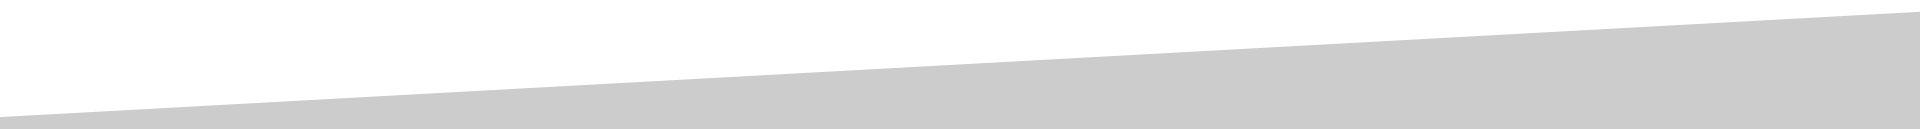 detalhe-layout-servicos-topo-2